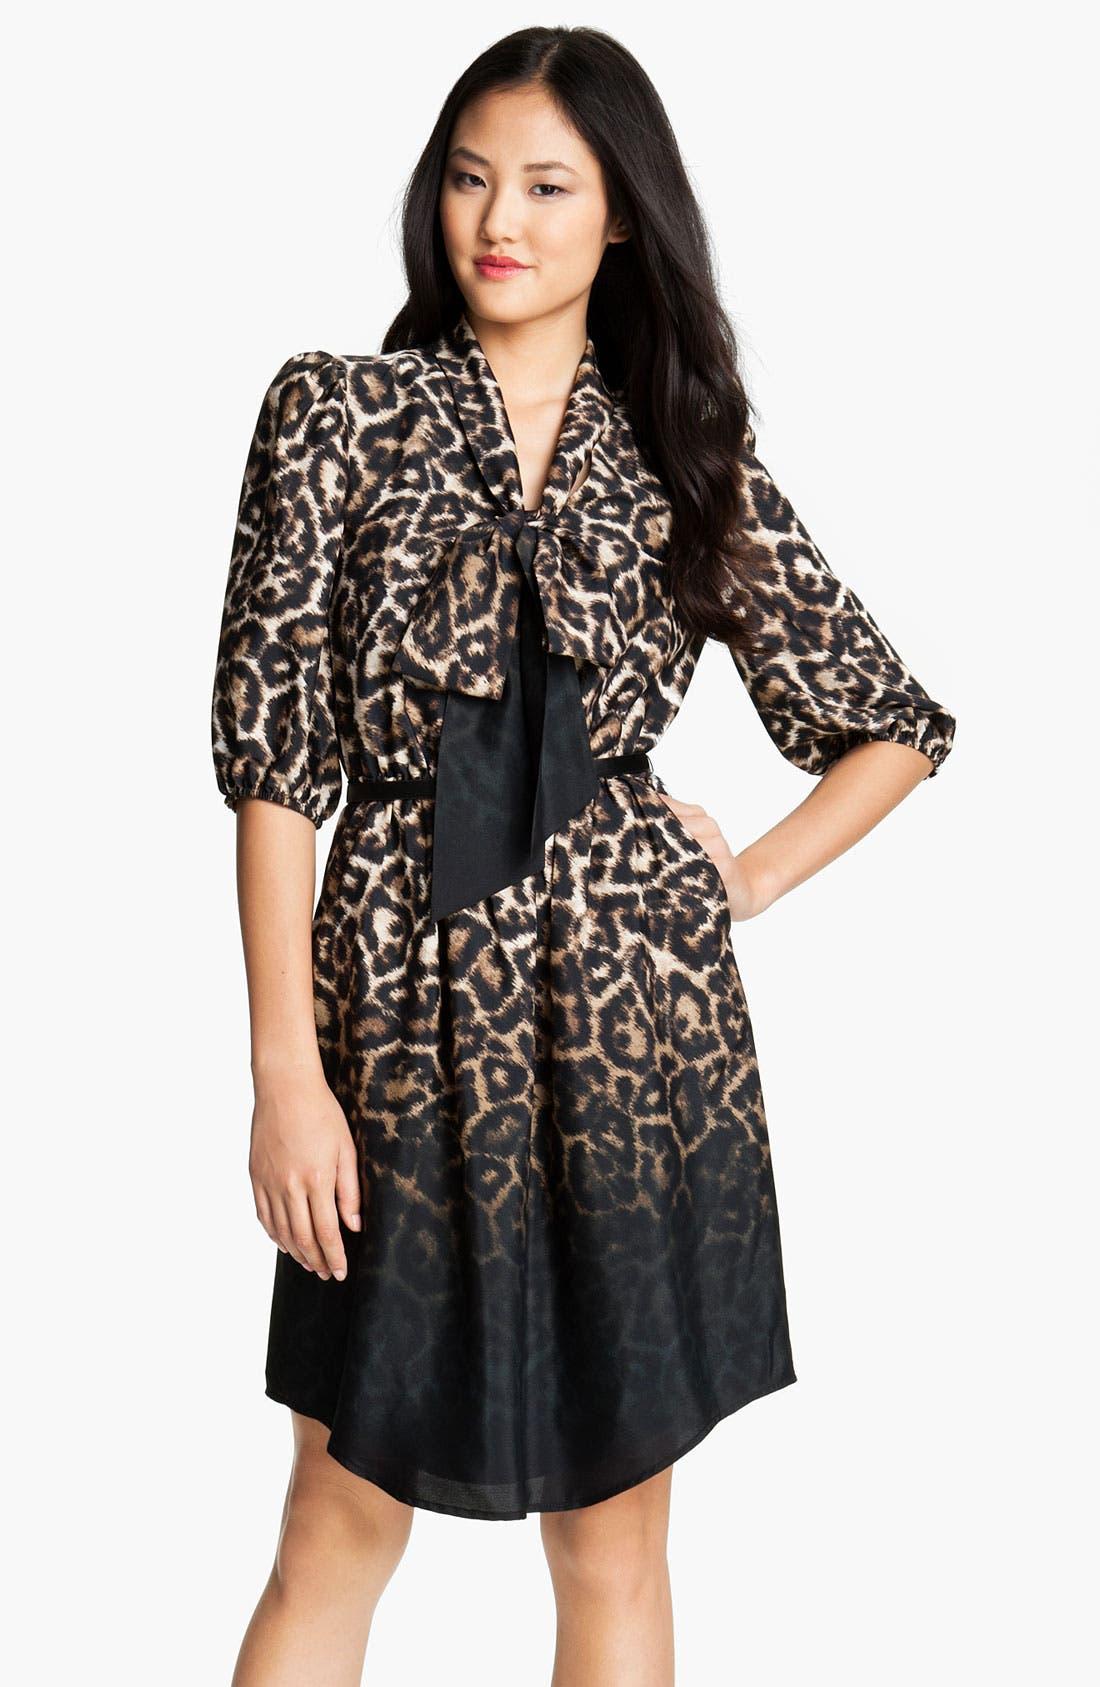 Alternate Image 1 Selected - Vince Camuto Leopard Print Tie Front Shirt Dress